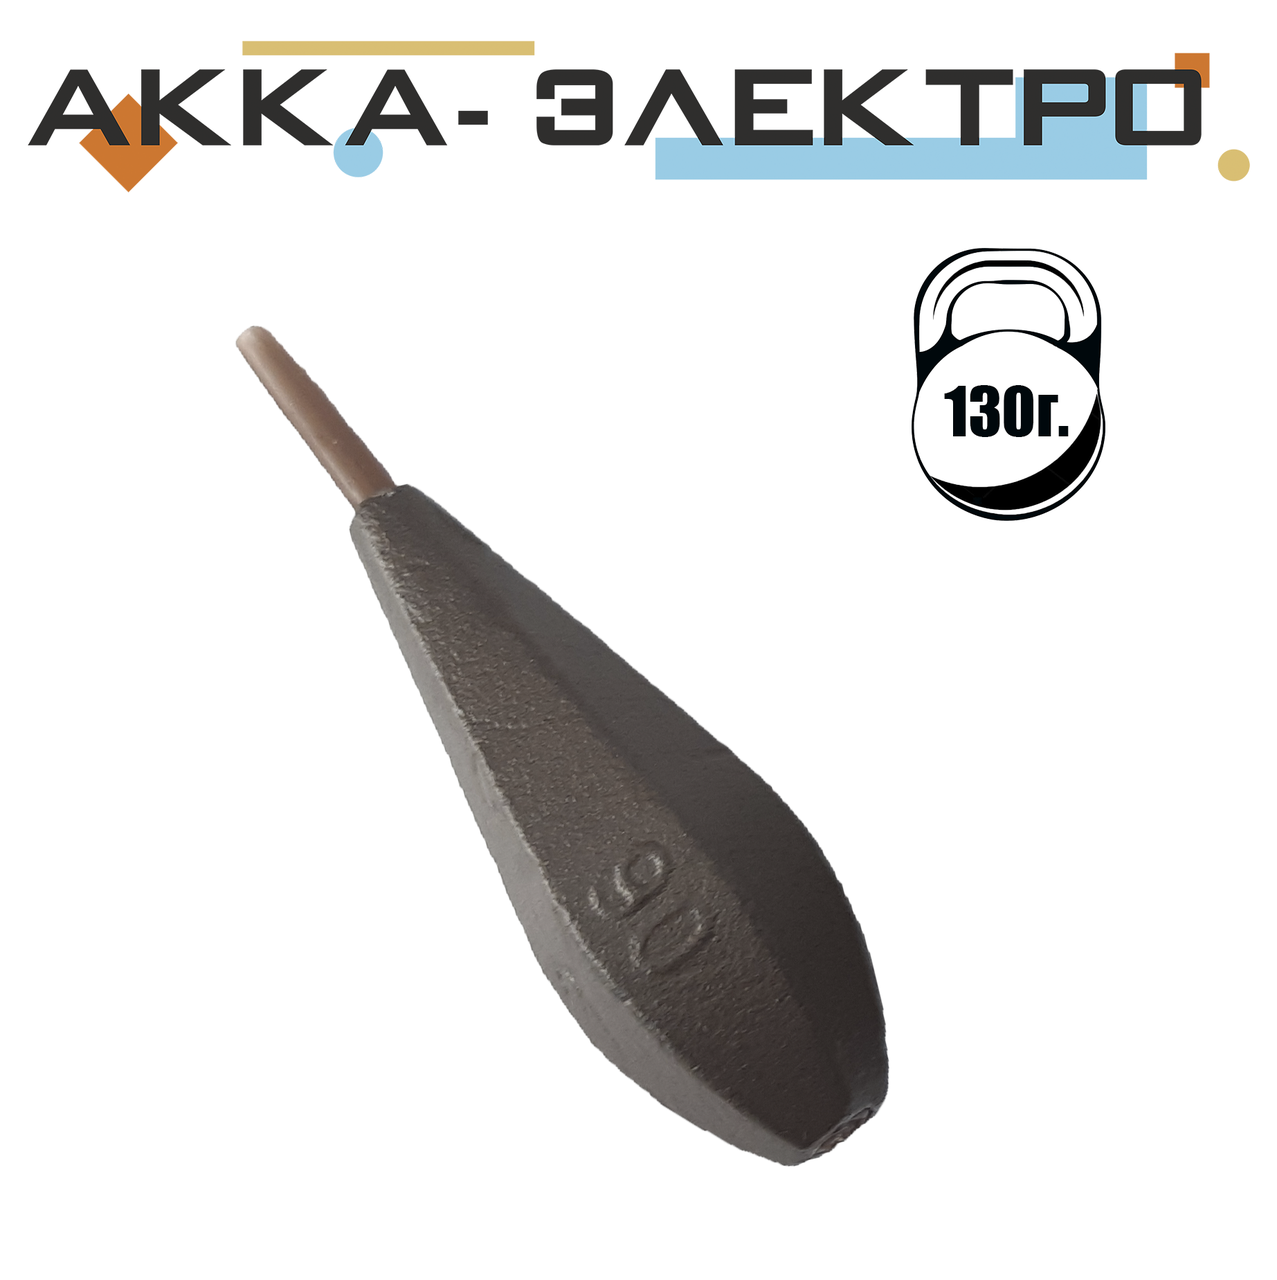 Груз карповый Горизонт in-Line 130г (10 шт)